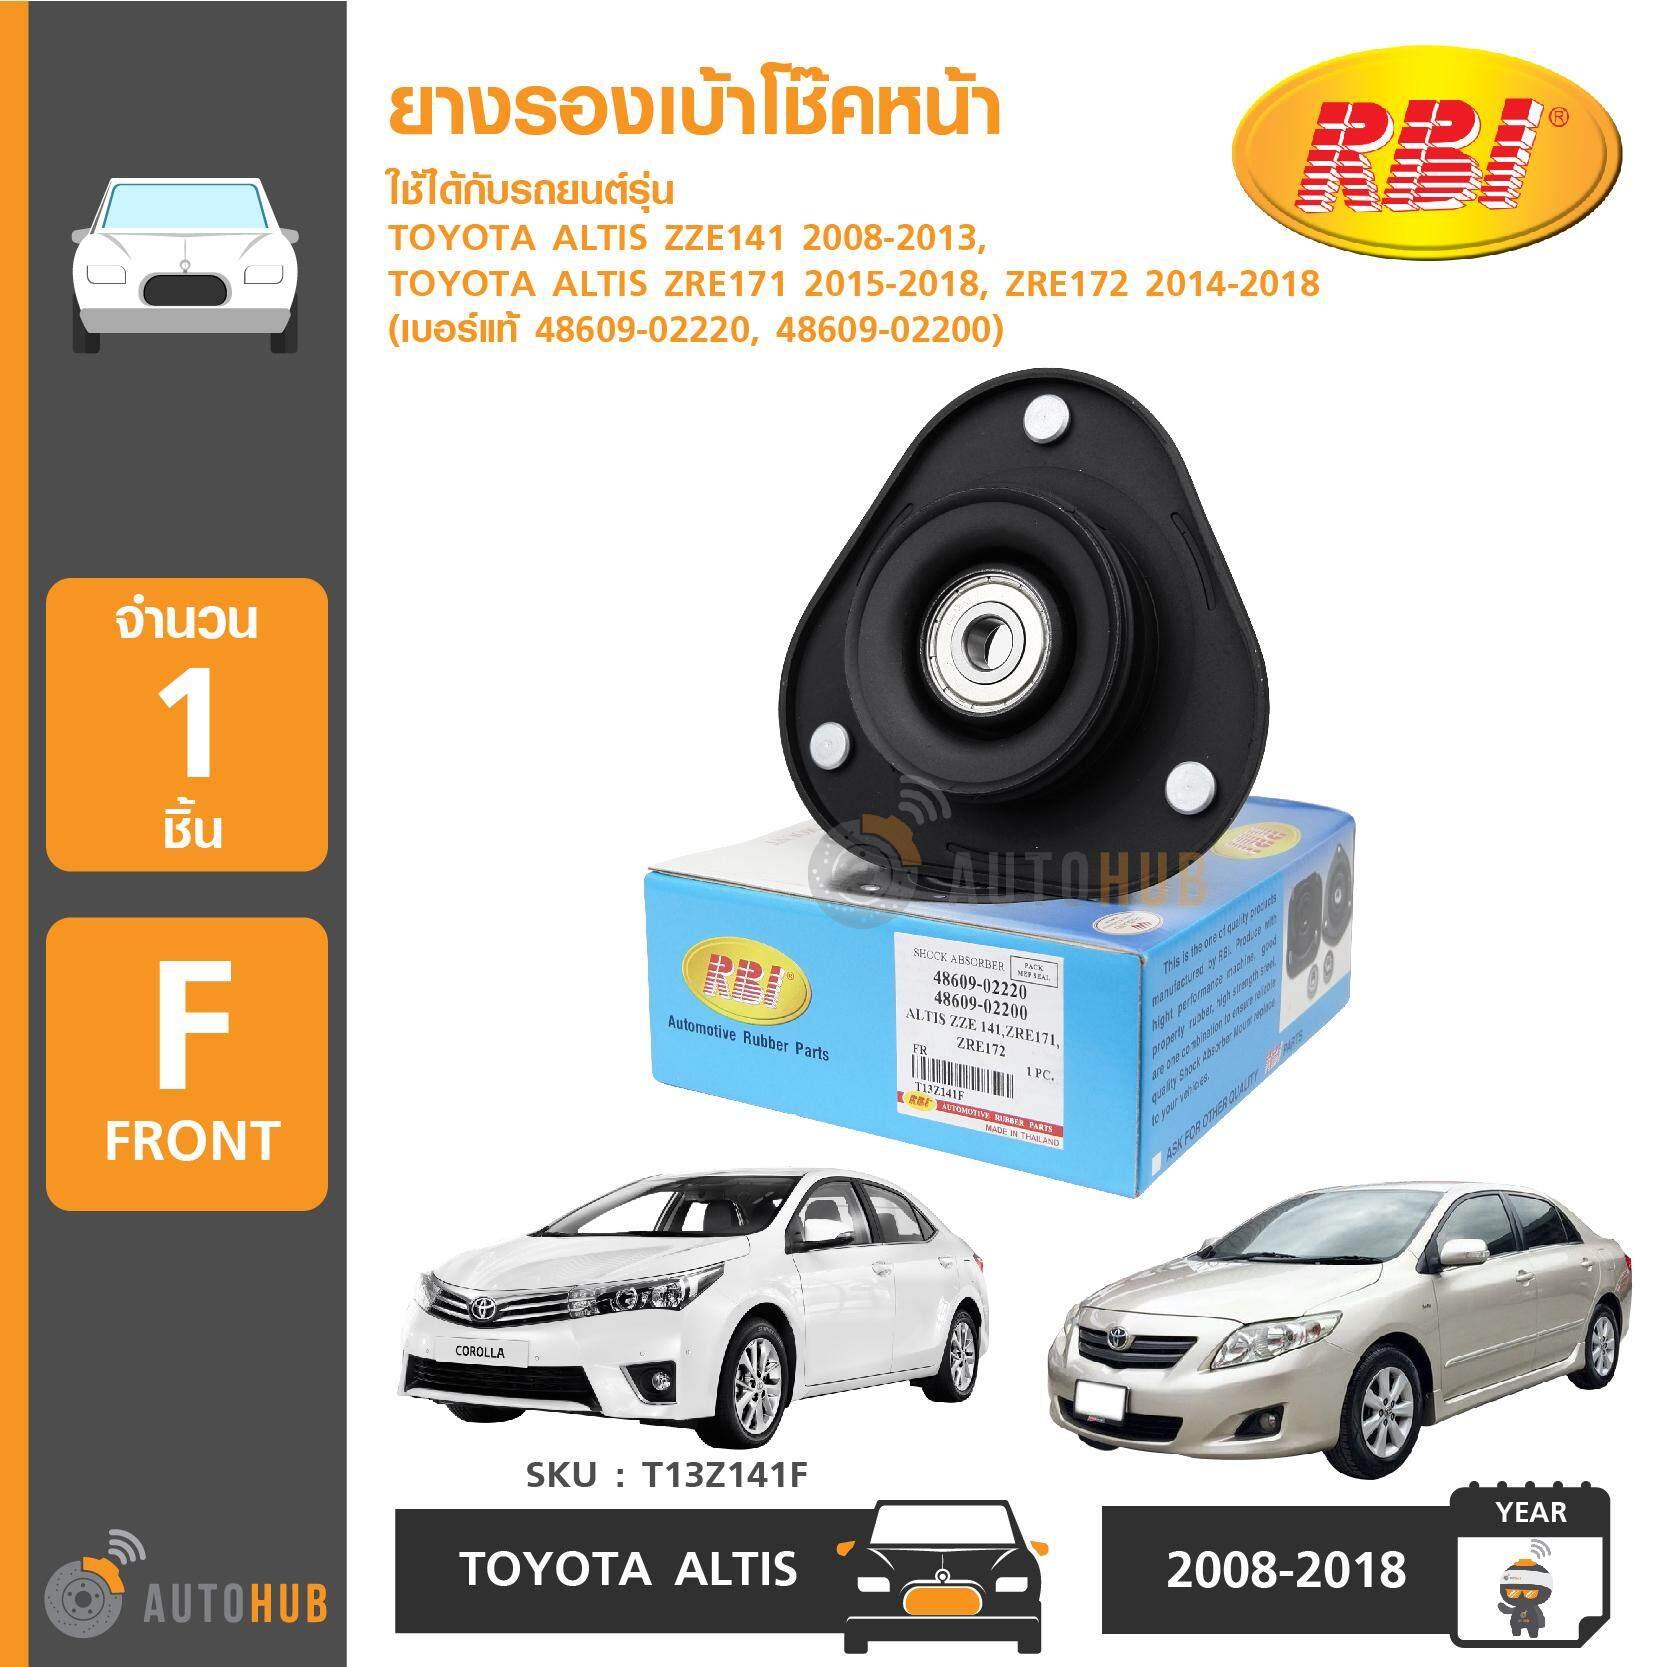 Rbi ยางรองเบ้าโช๊คหน้า Toyota Altis ปี 2008-2013 (t13z141f) By Autohub.